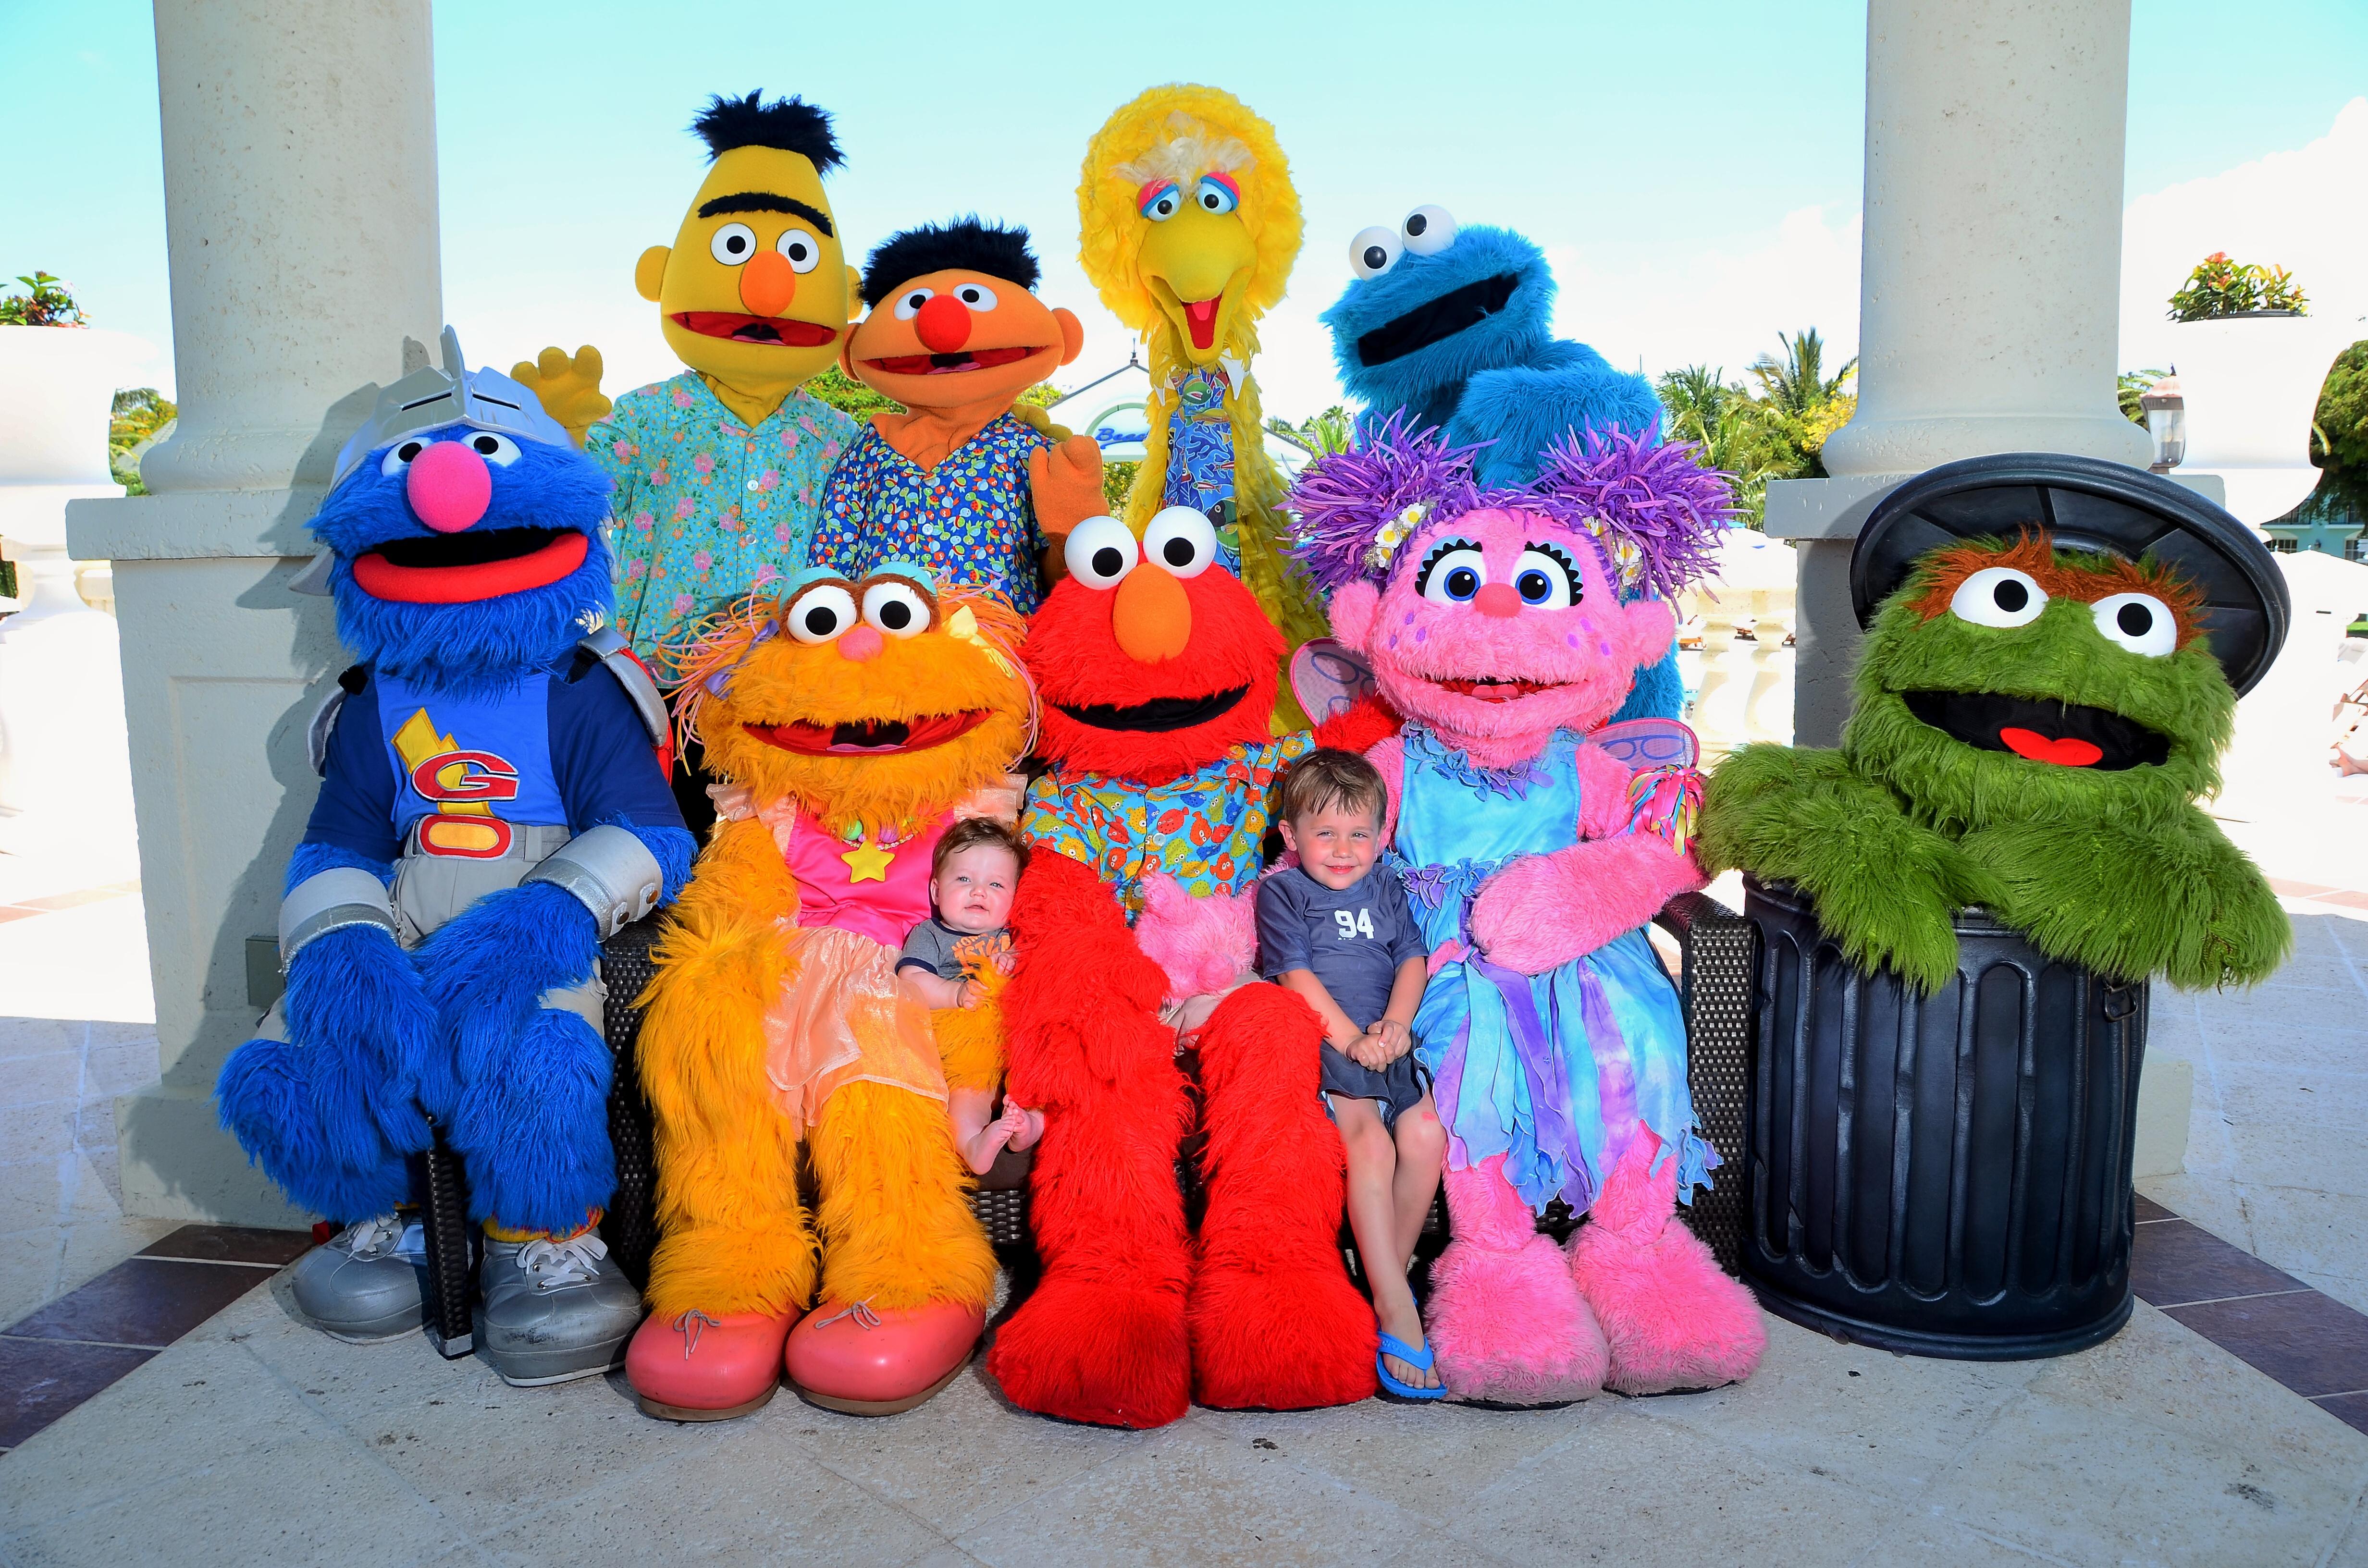 Trip to Sesame Street